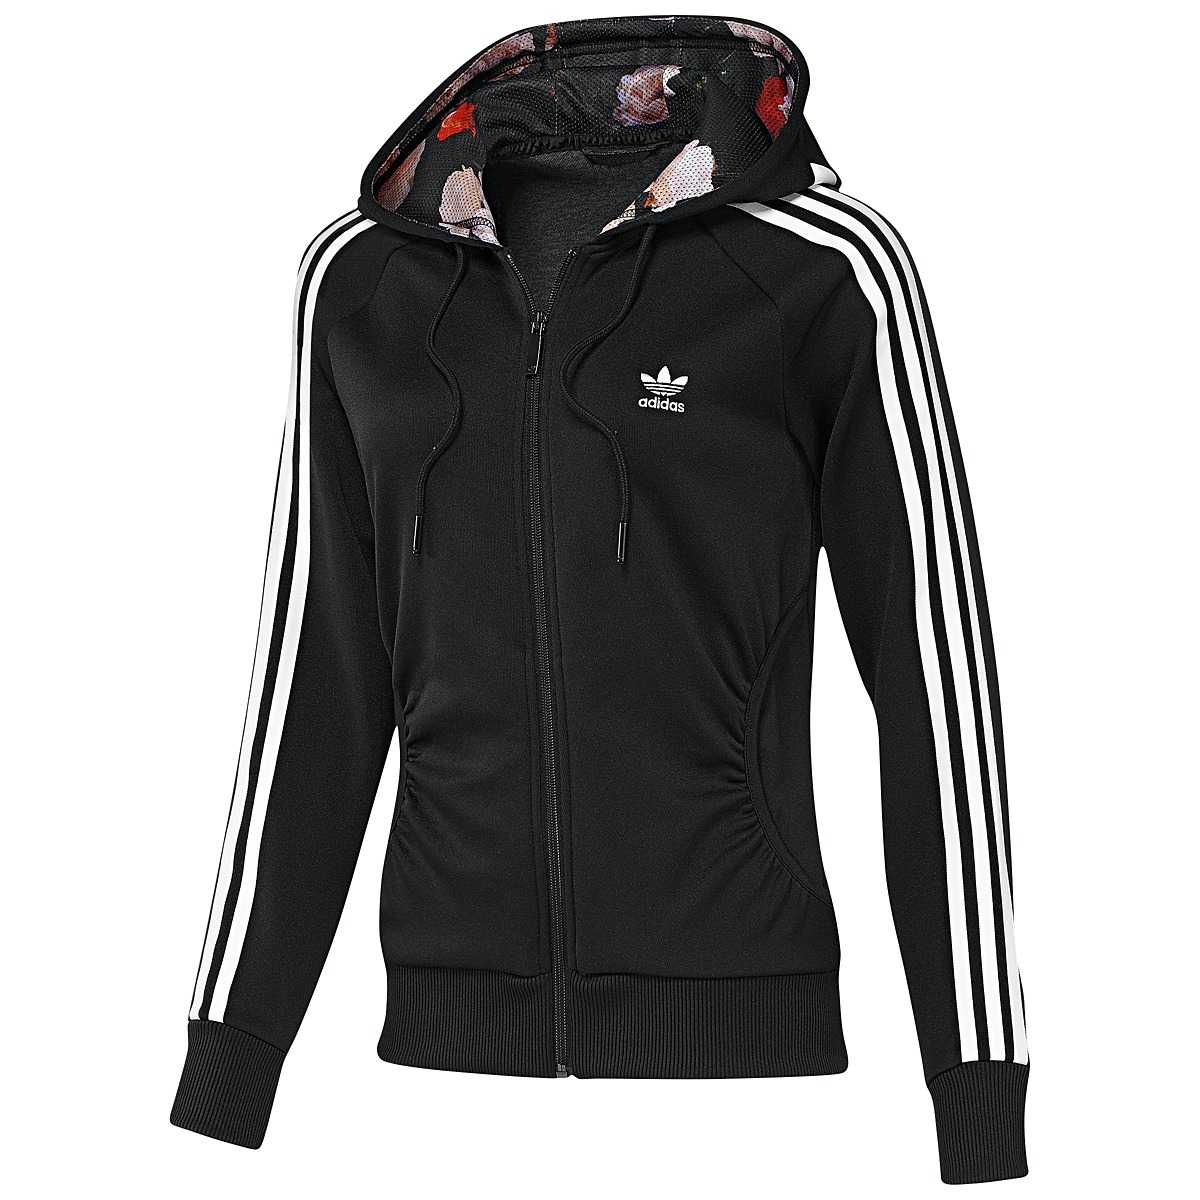 adidas originals girly hoodie damen baumwolle jacke kapuzenjacke blau grau ebay. Black Bedroom Furniture Sets. Home Design Ideas